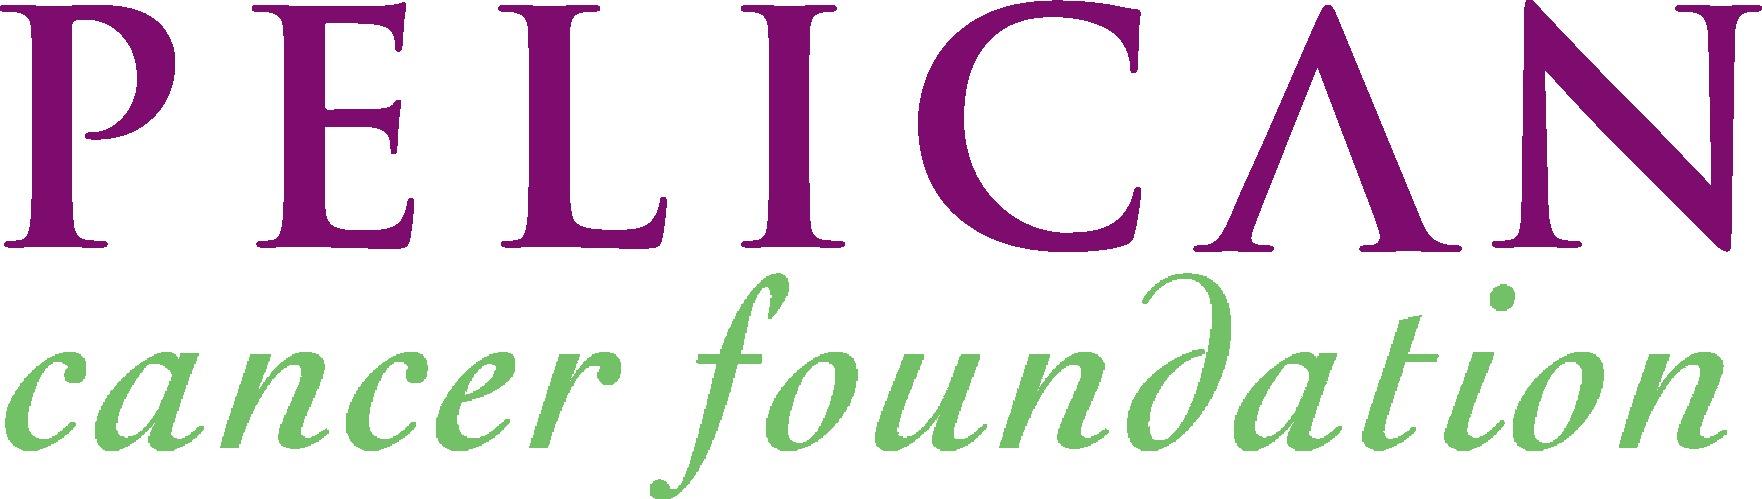 Pelican Cancer Foundation